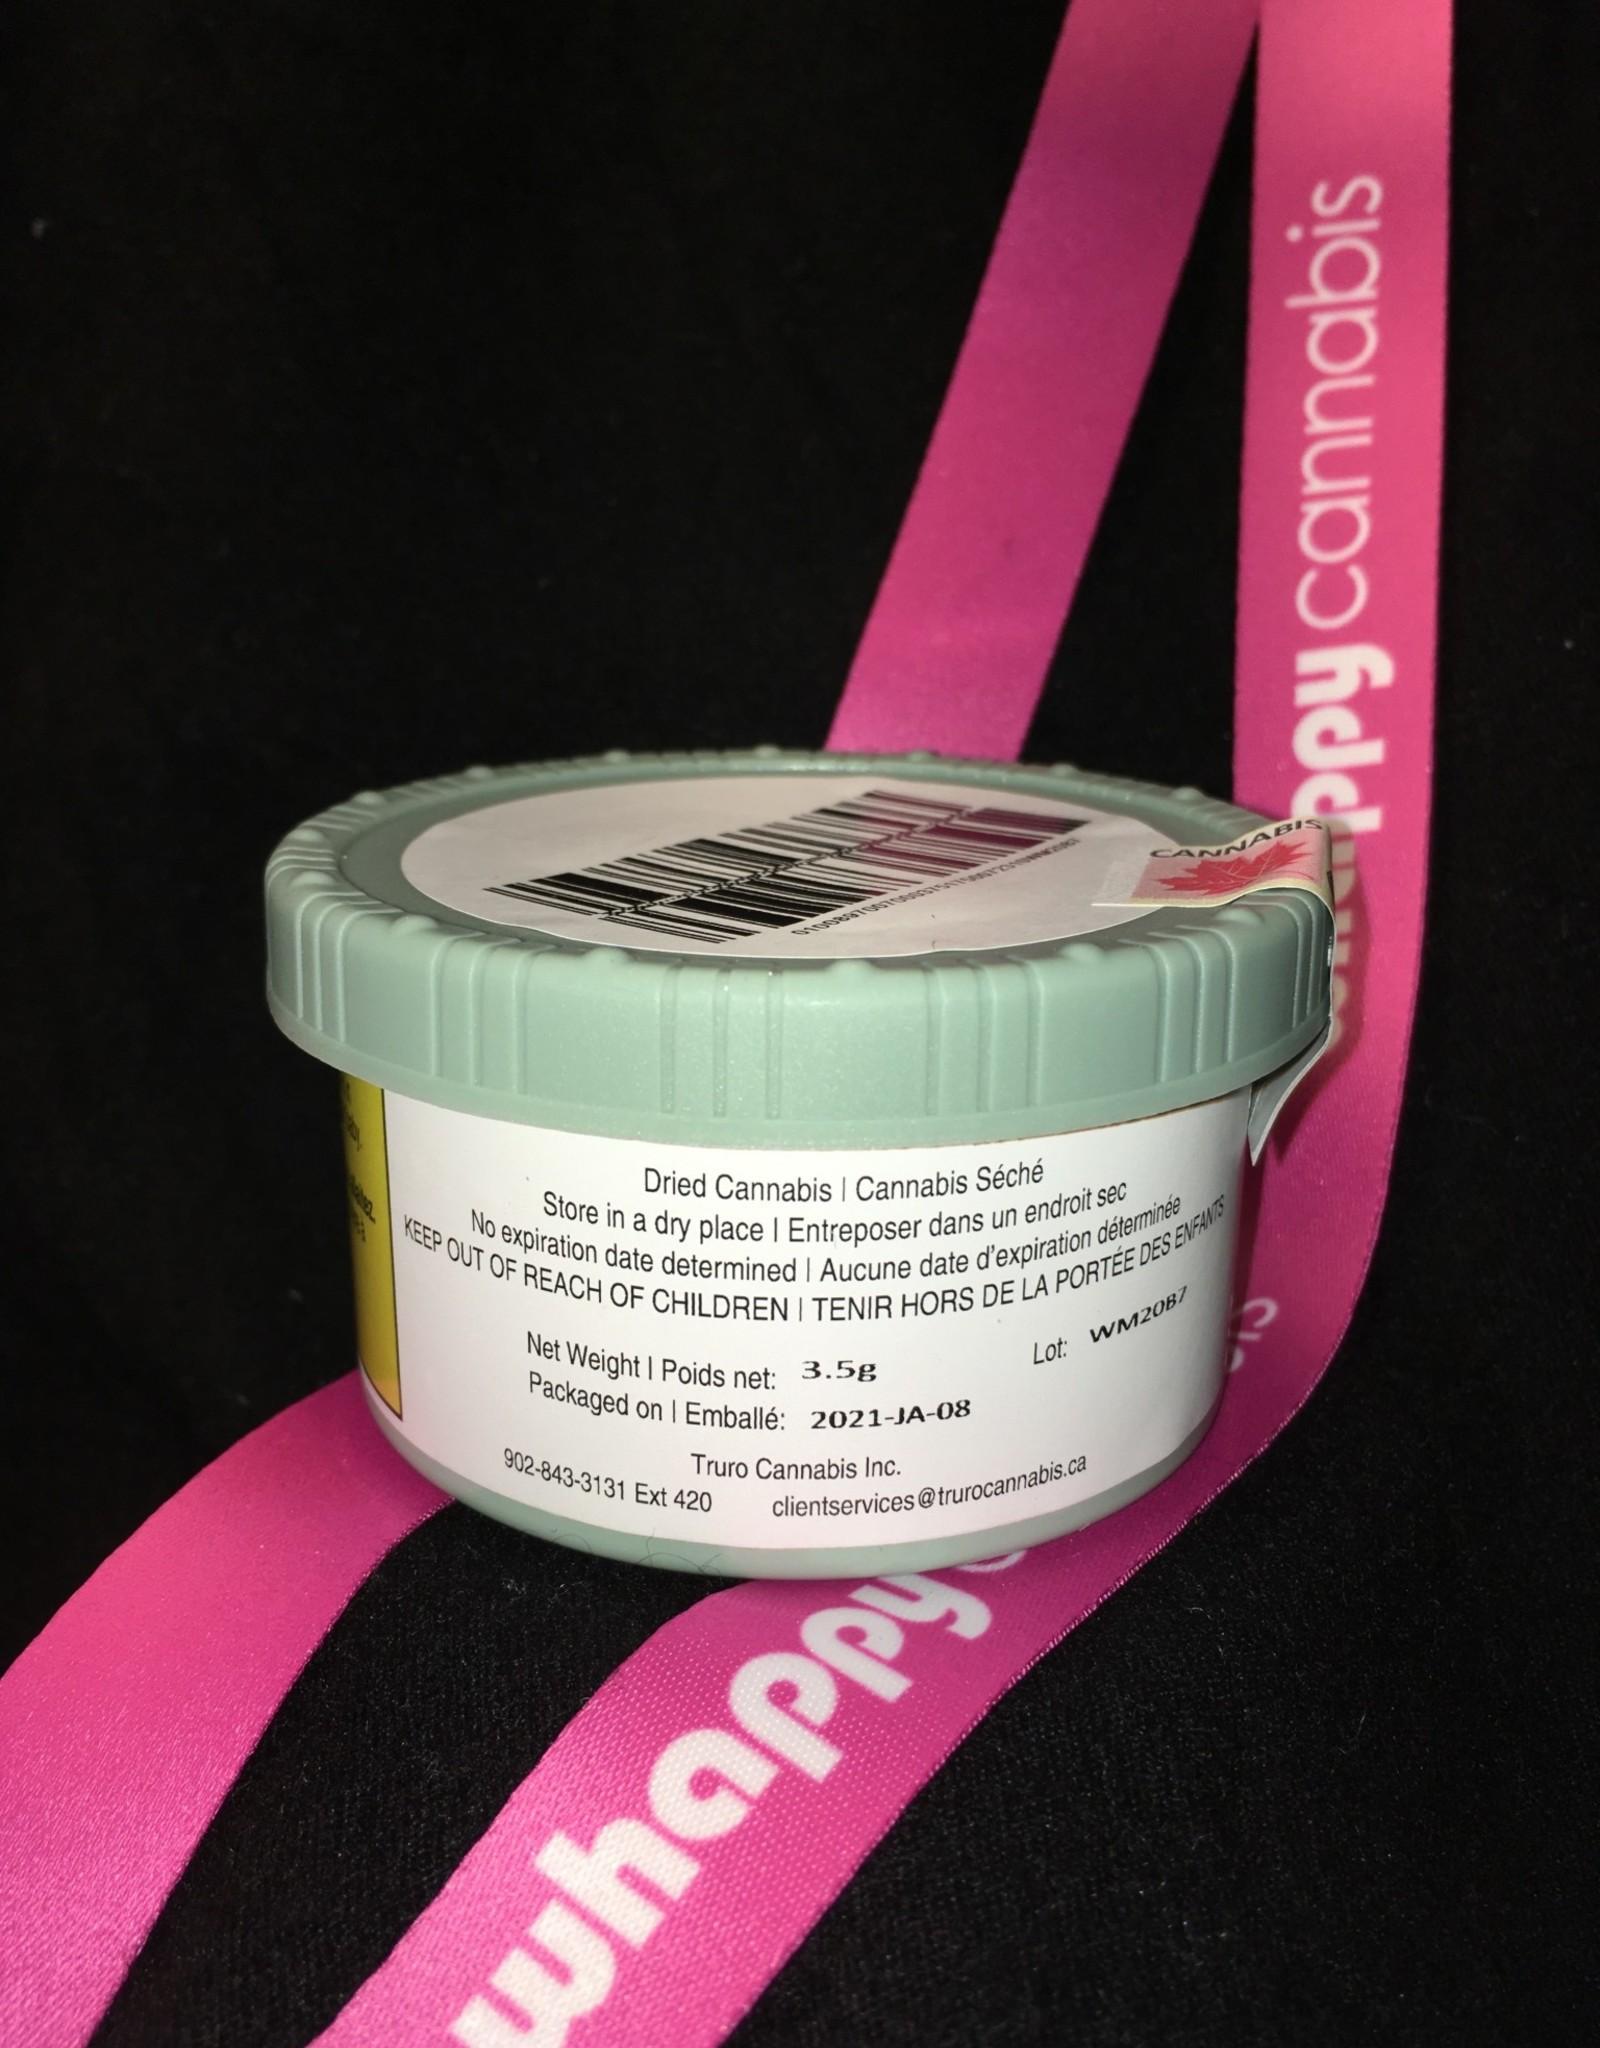 TRURO Cannabis TRURO - Wedding Mint Indica 3.5g